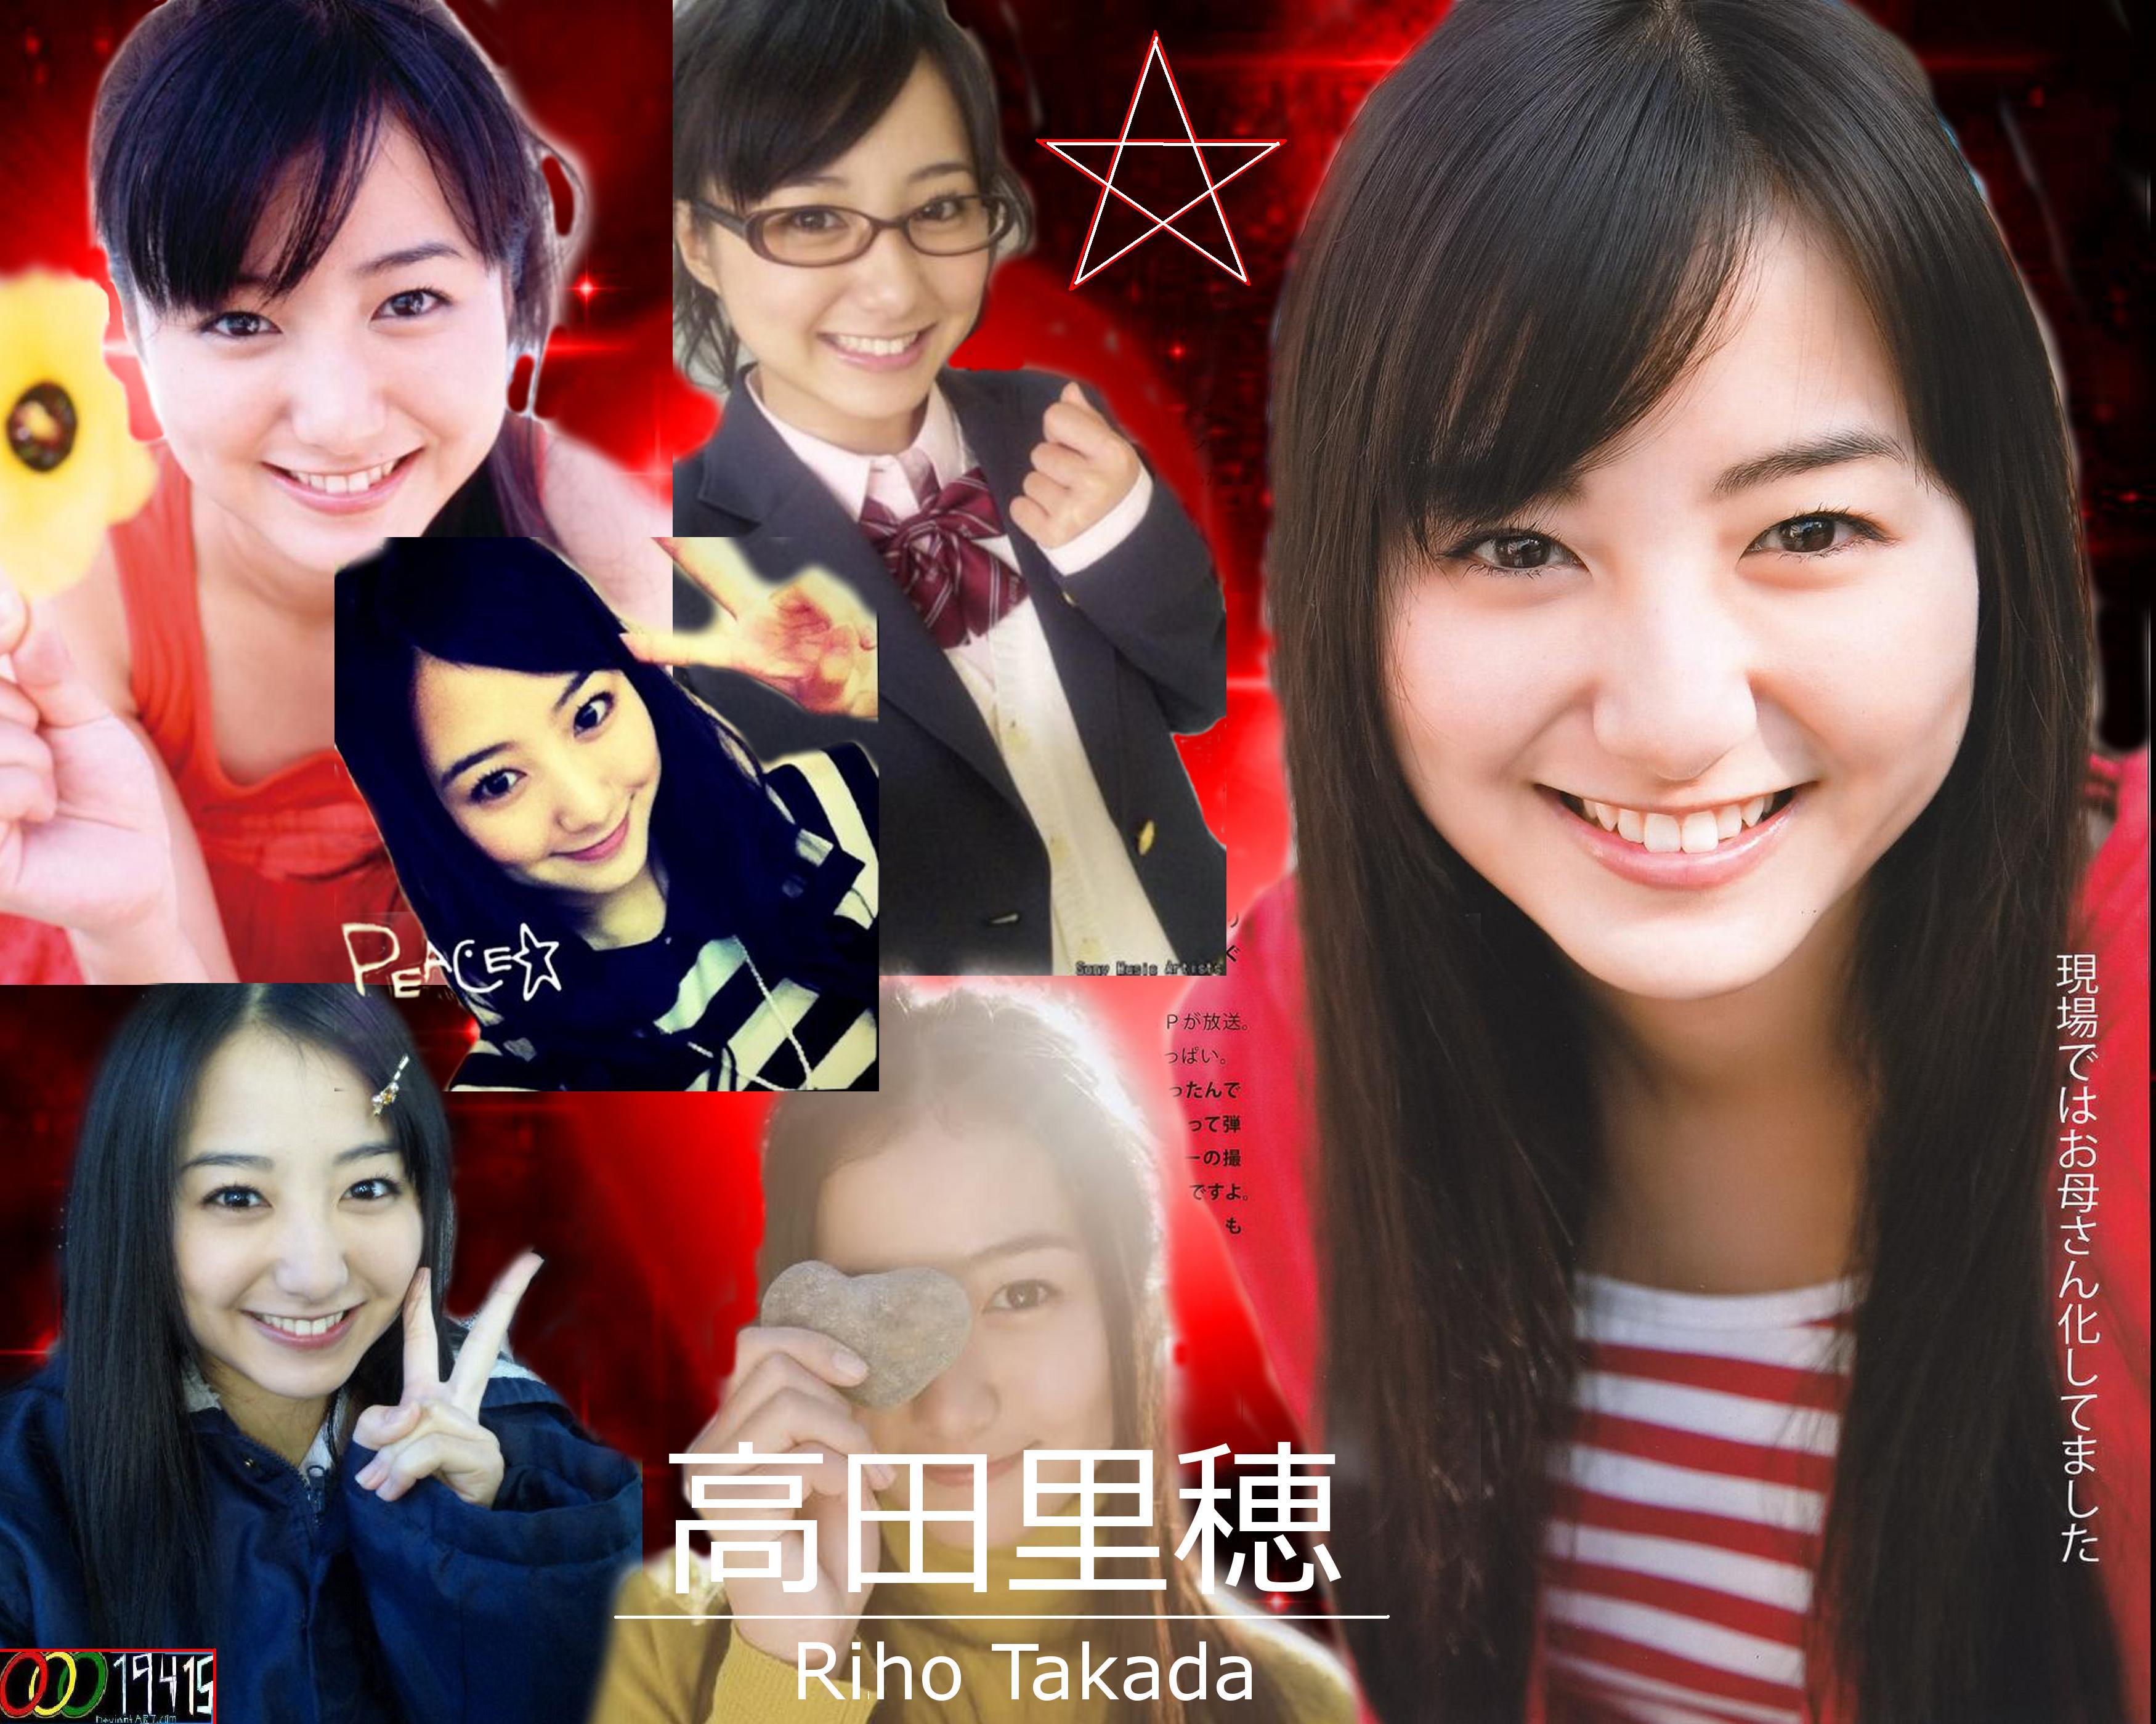 takada riho special ... Riho Takada Tribute: Version 2.0 by OOO19415